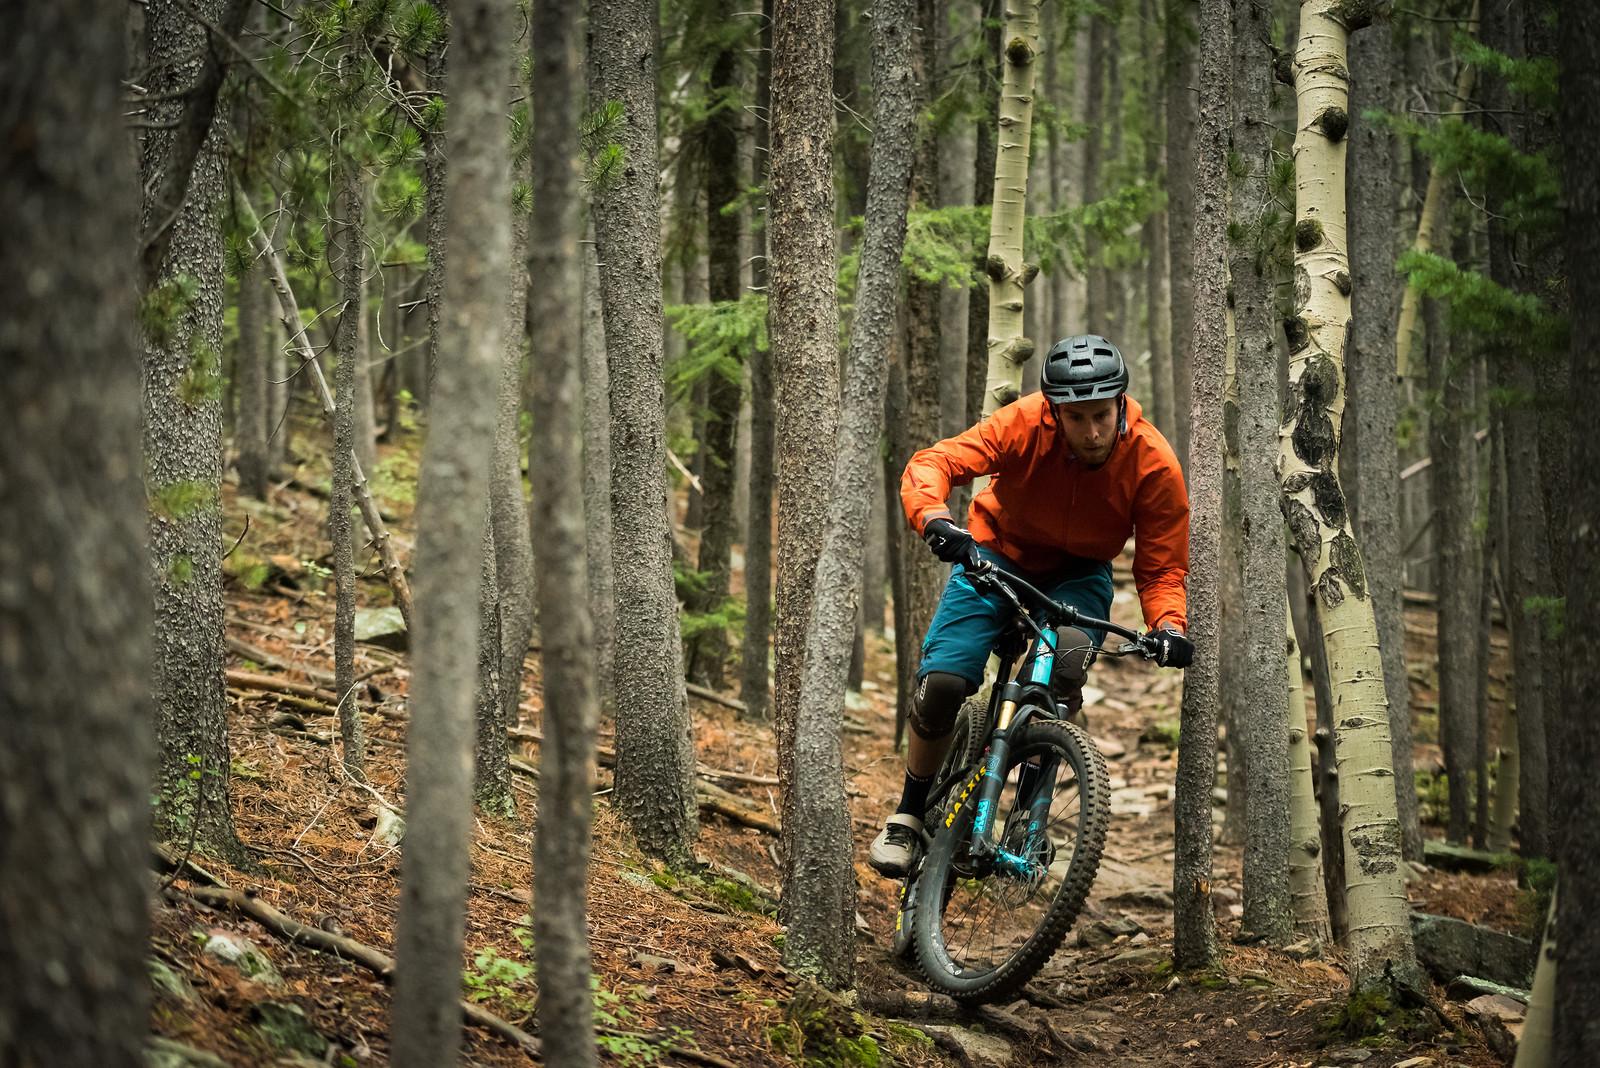 Threading the Needle - russellpj - Mountain Biking Pictures - Vital MTB